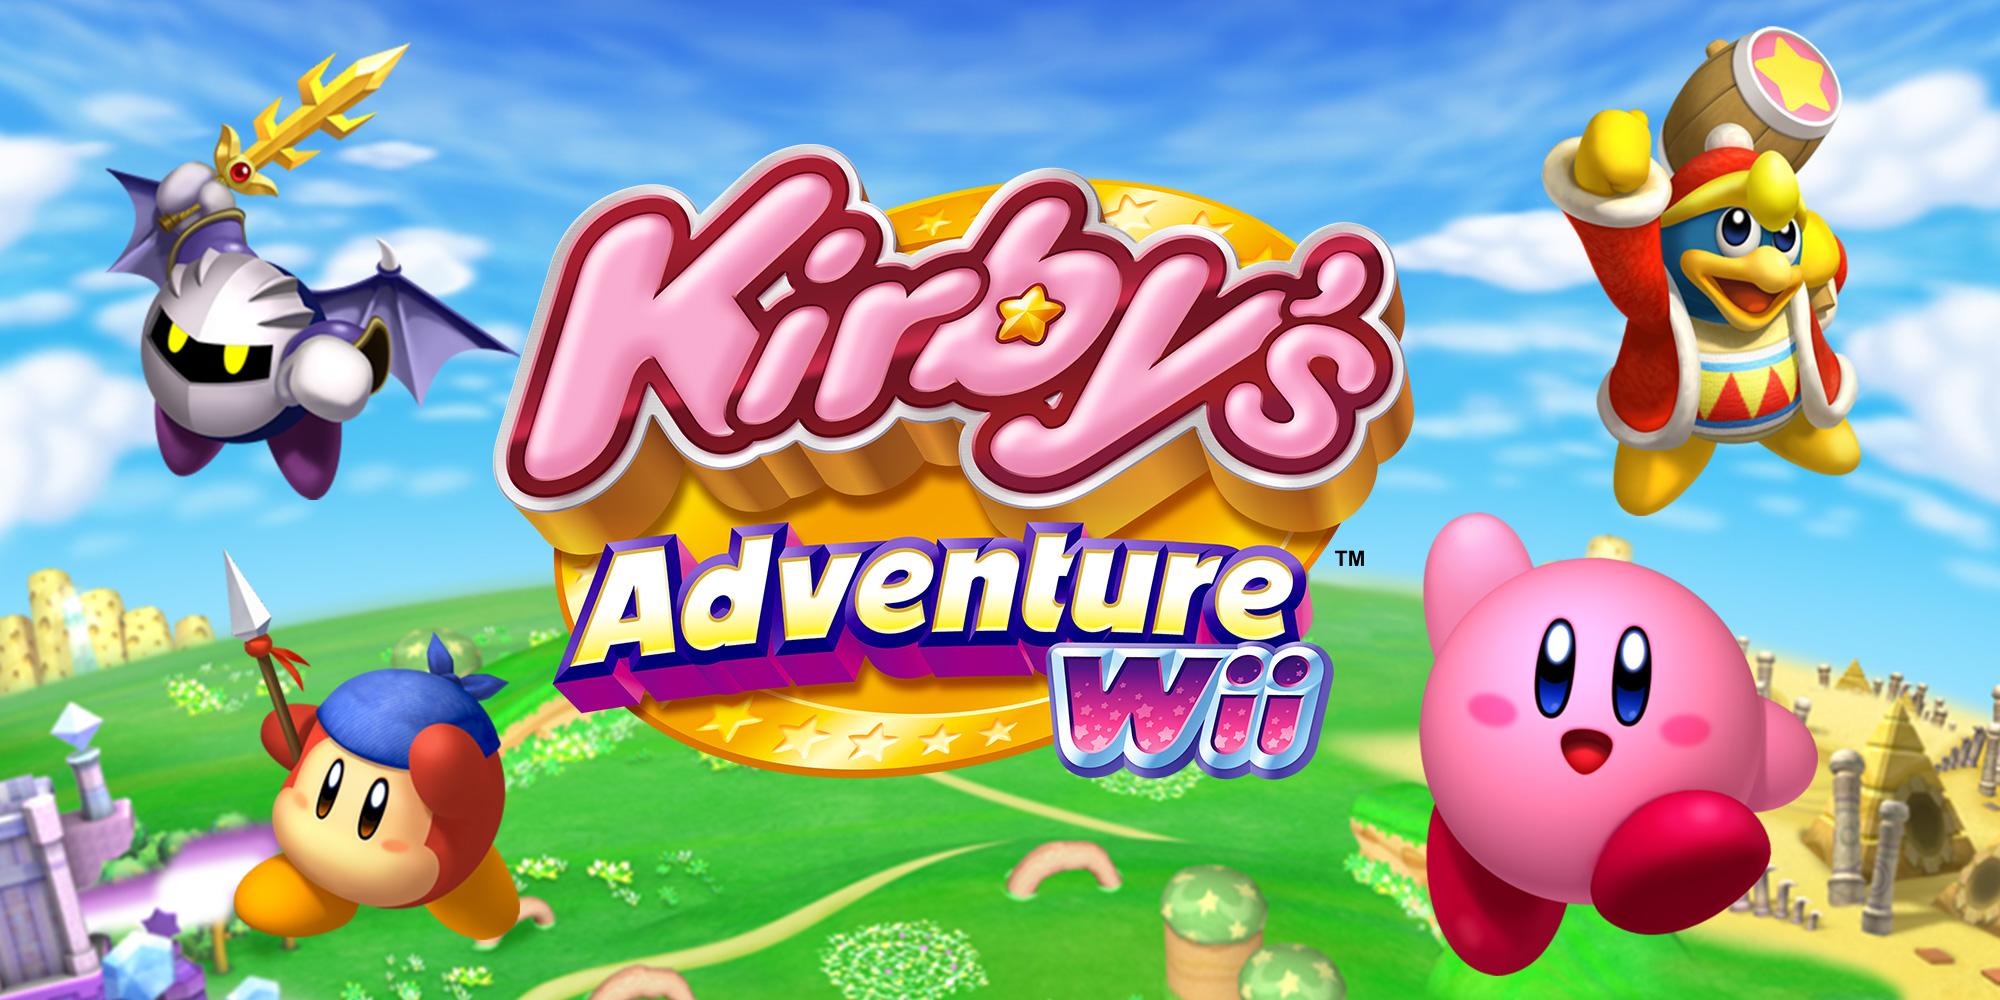 Kirby Wii U